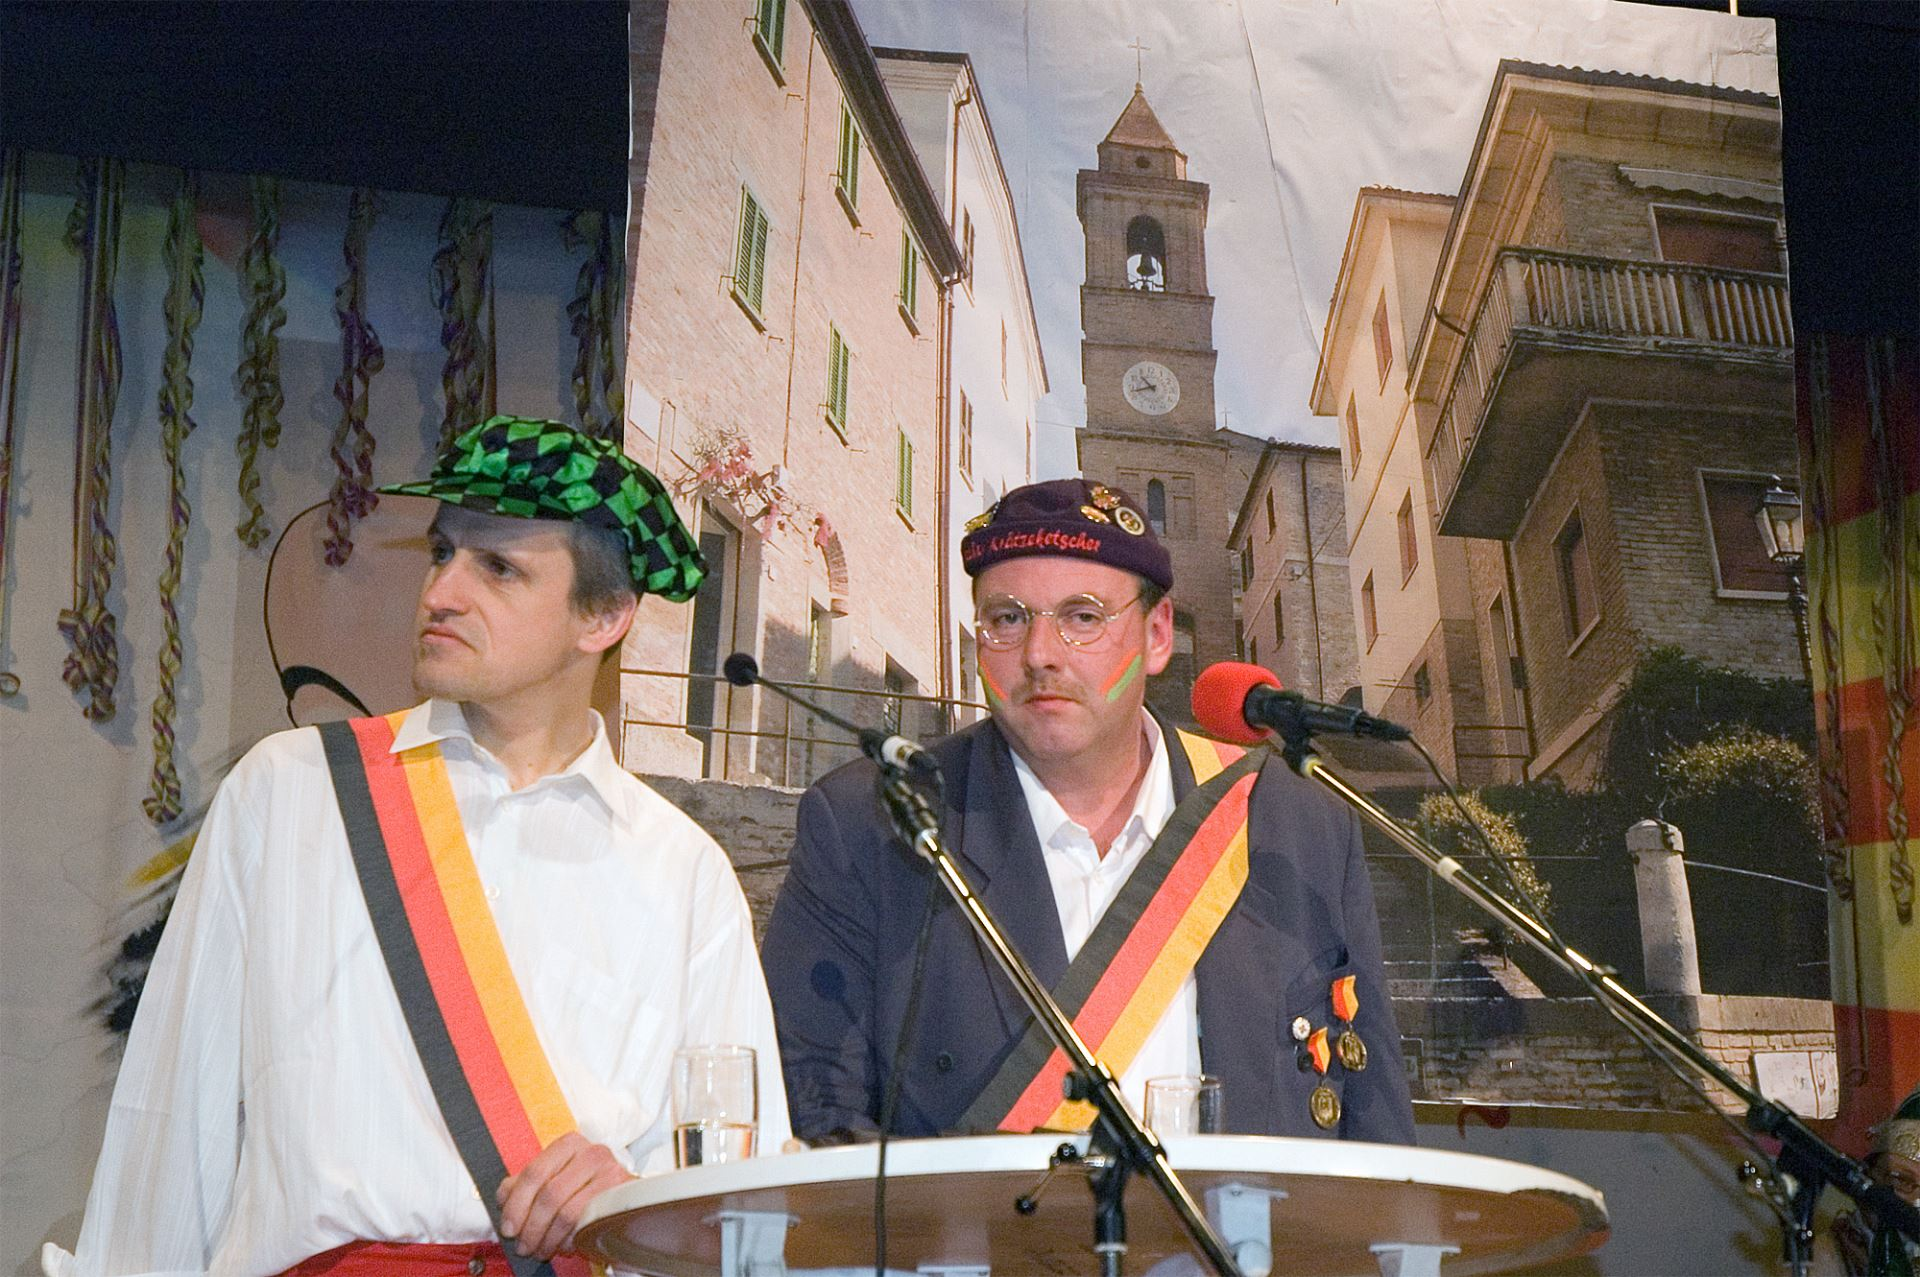 Fasentsitzung in Langenbrand 2008 (17)